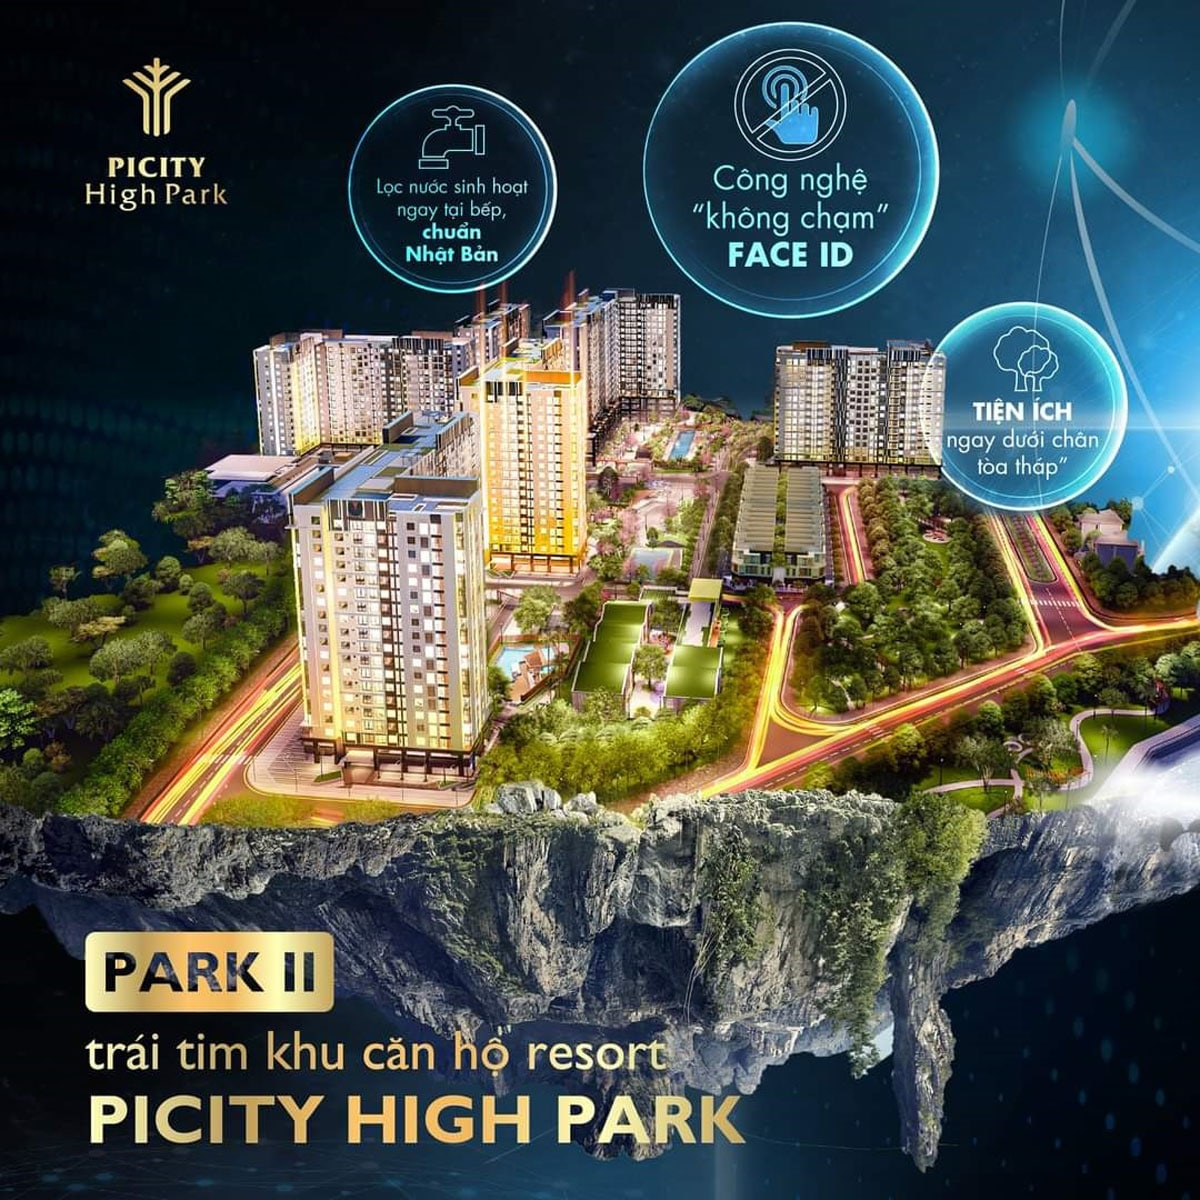 Park 2 trai tim cua du an picity high park - PICITY HIGH PARK